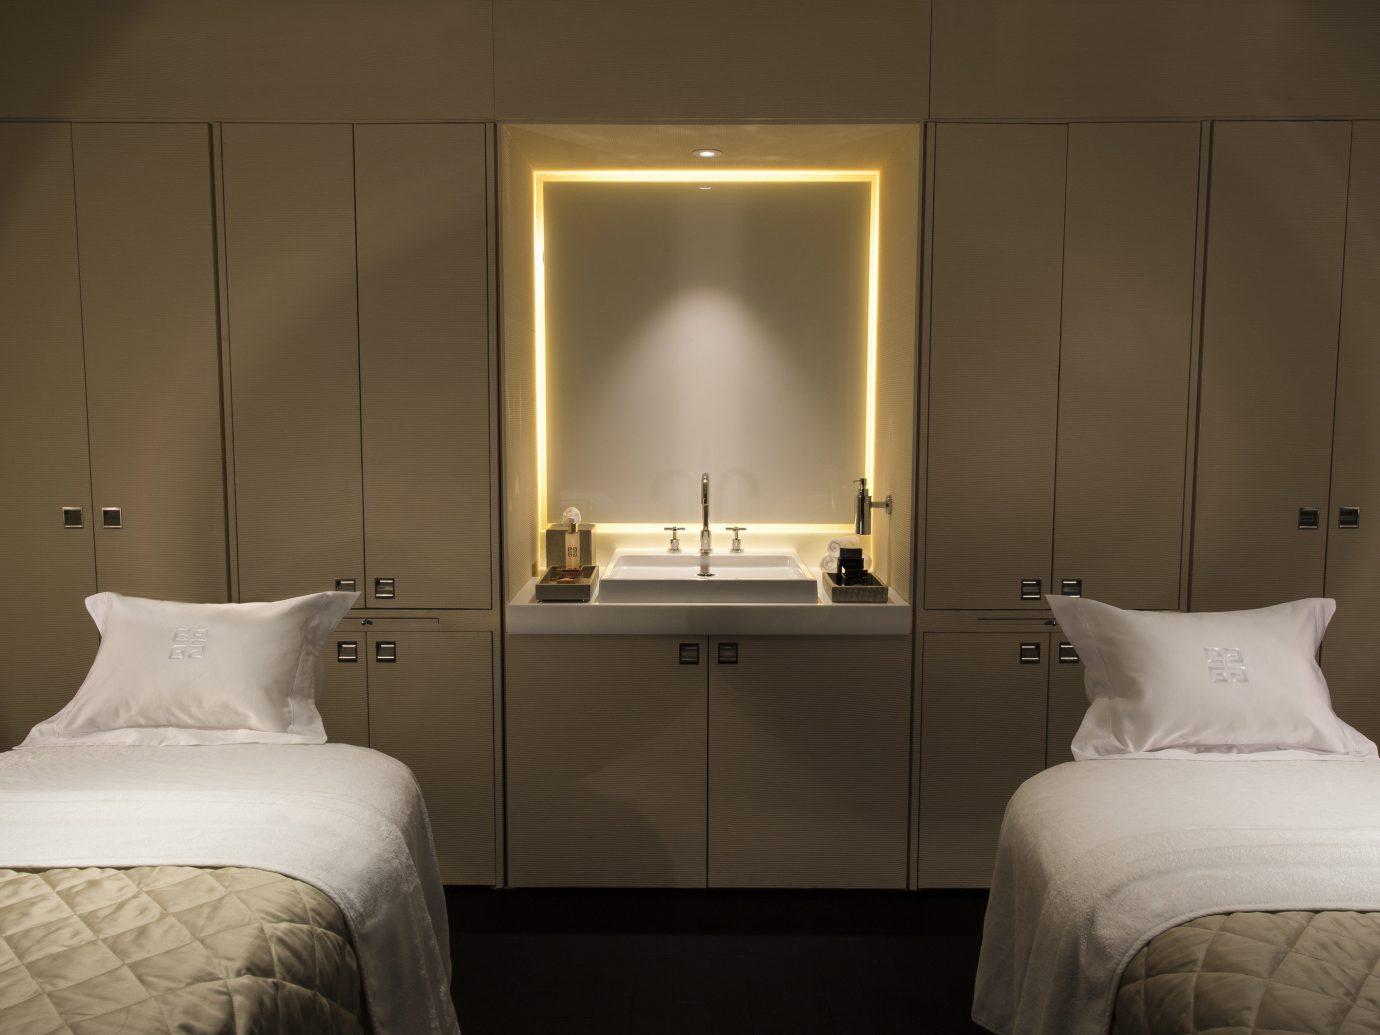 Hotels Romance bed wall indoor room Bedroom hotel interior design lighting pillow home window white Suite floor ceiling flooring night lamp